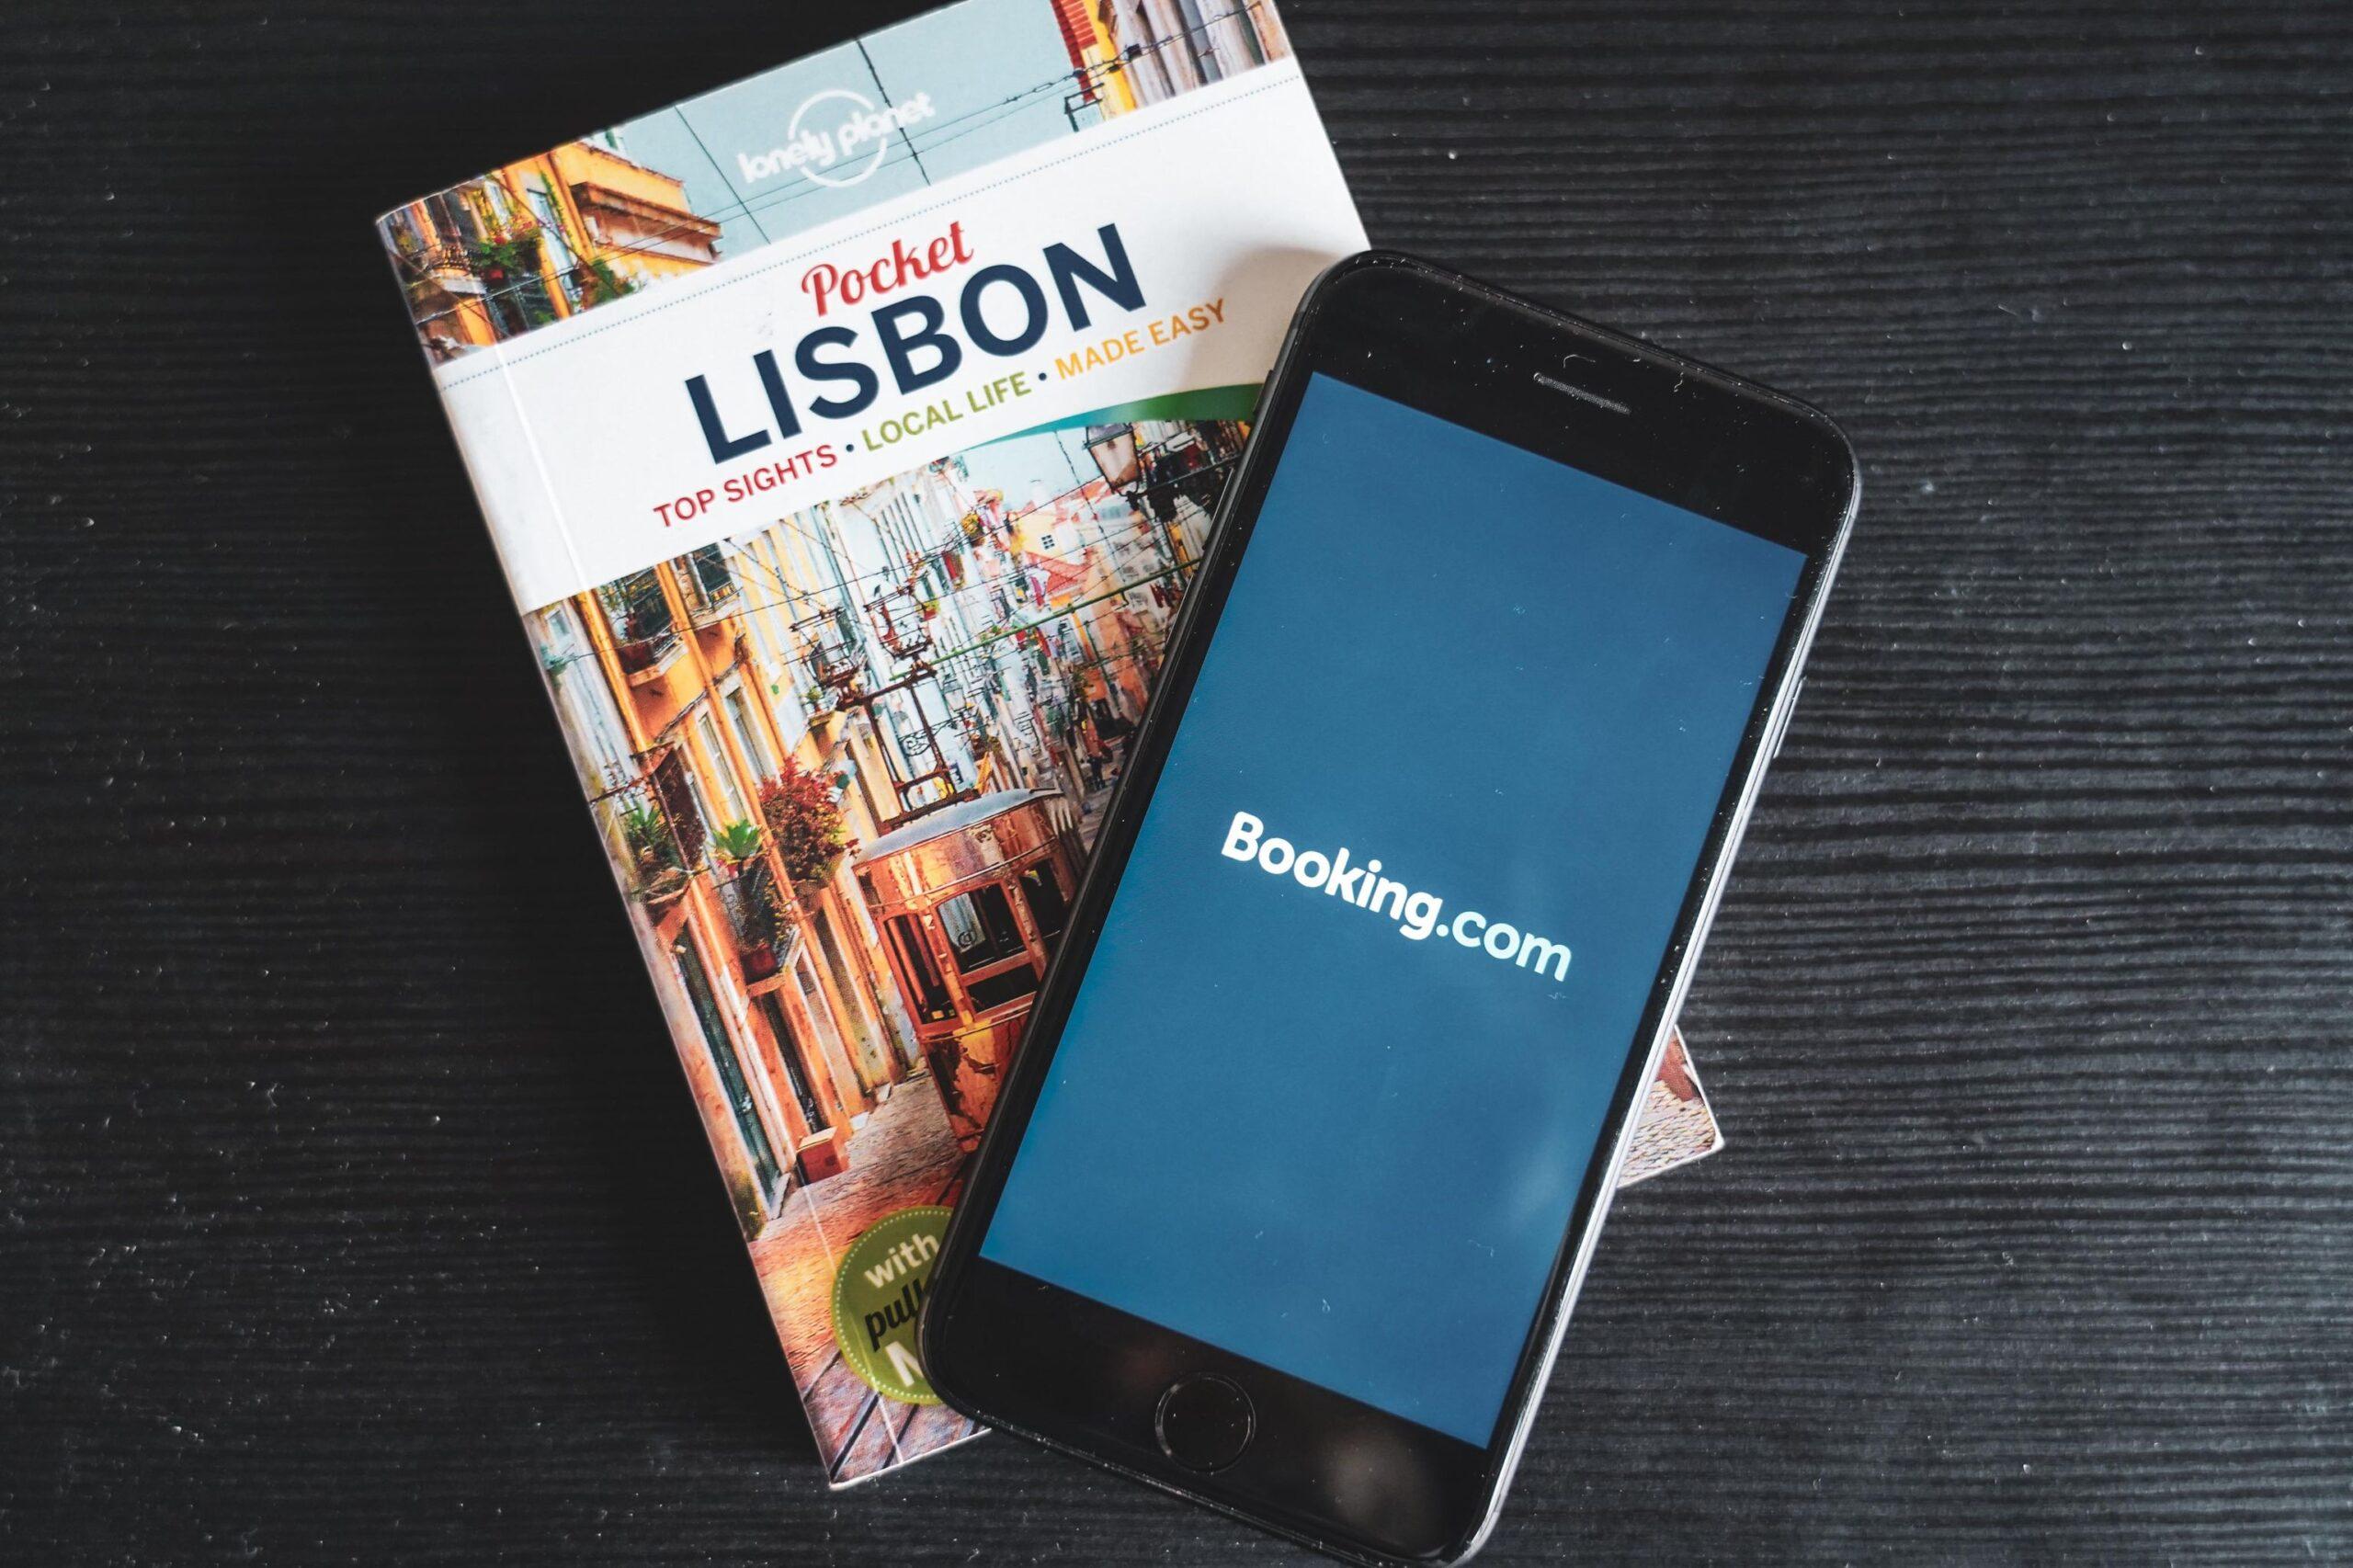 apps die je moet hebben tijdens reis - reisblog a travelnote